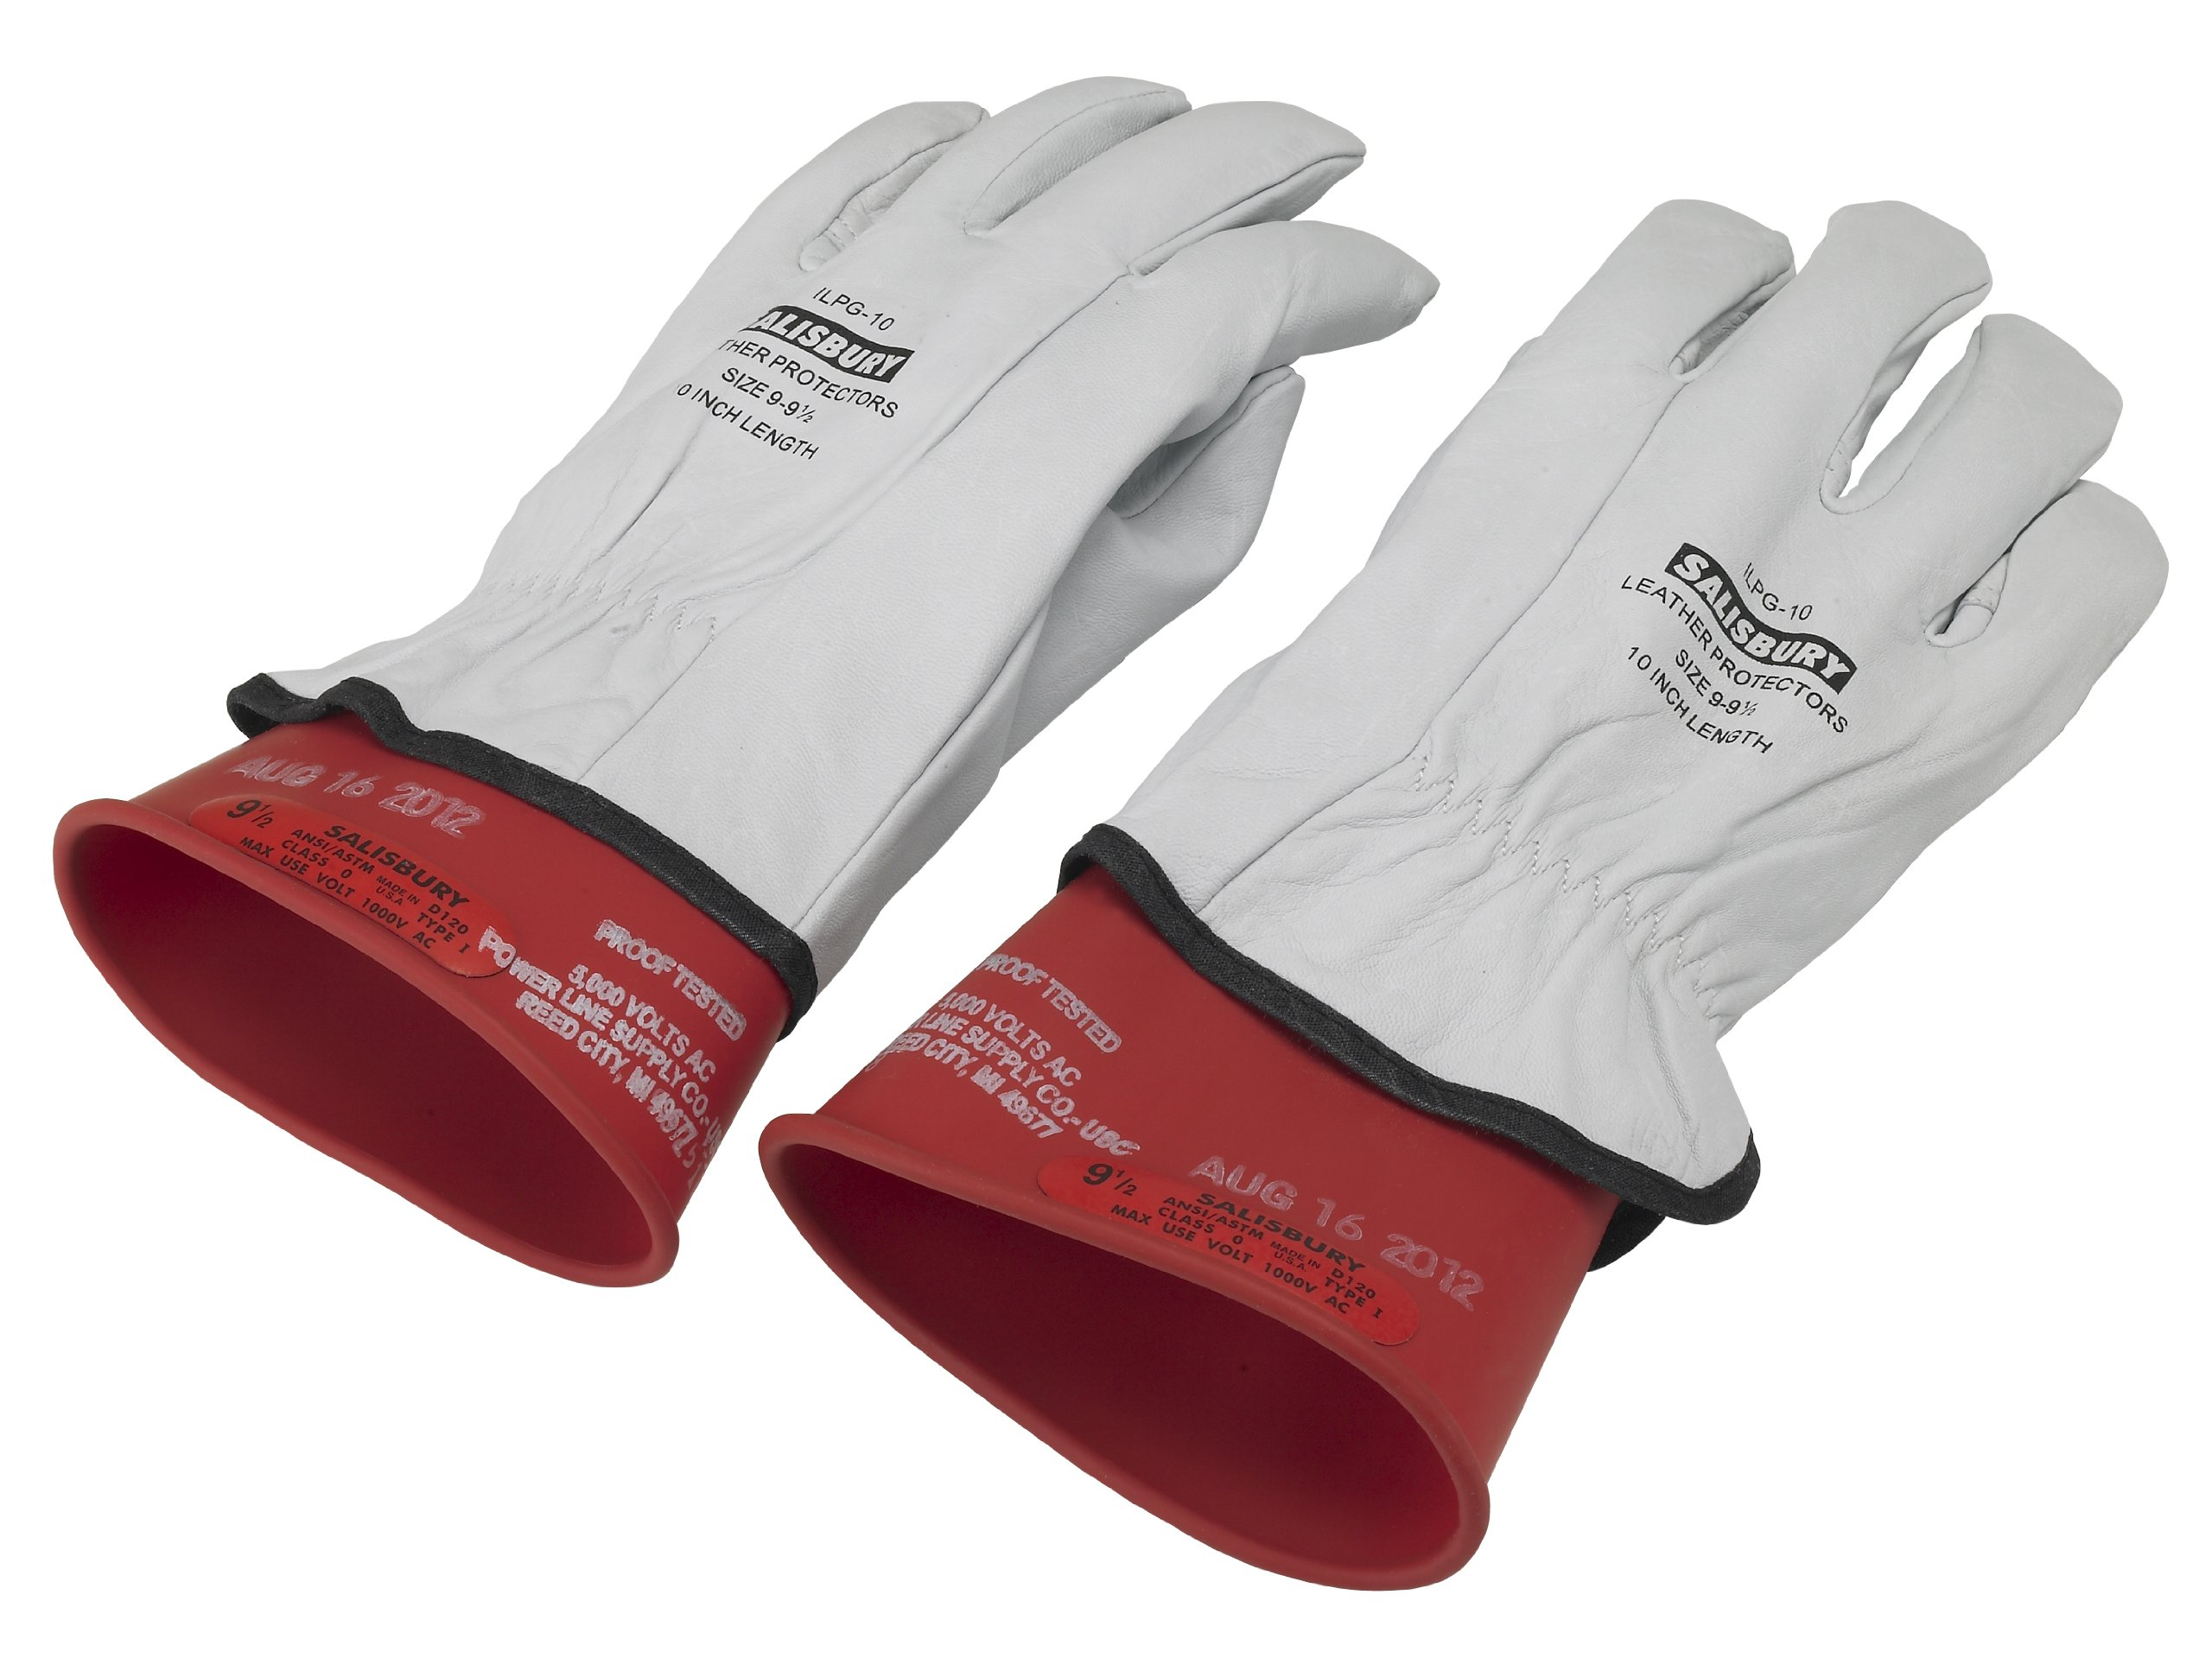 OTC 3991-10 Small Hybrid Electric Safety Gloves